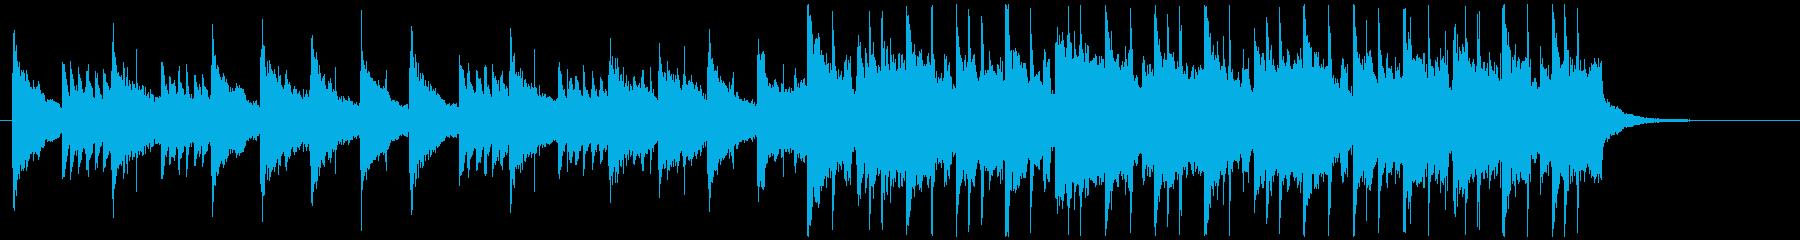 Mistrain / verse's reproduced waveform